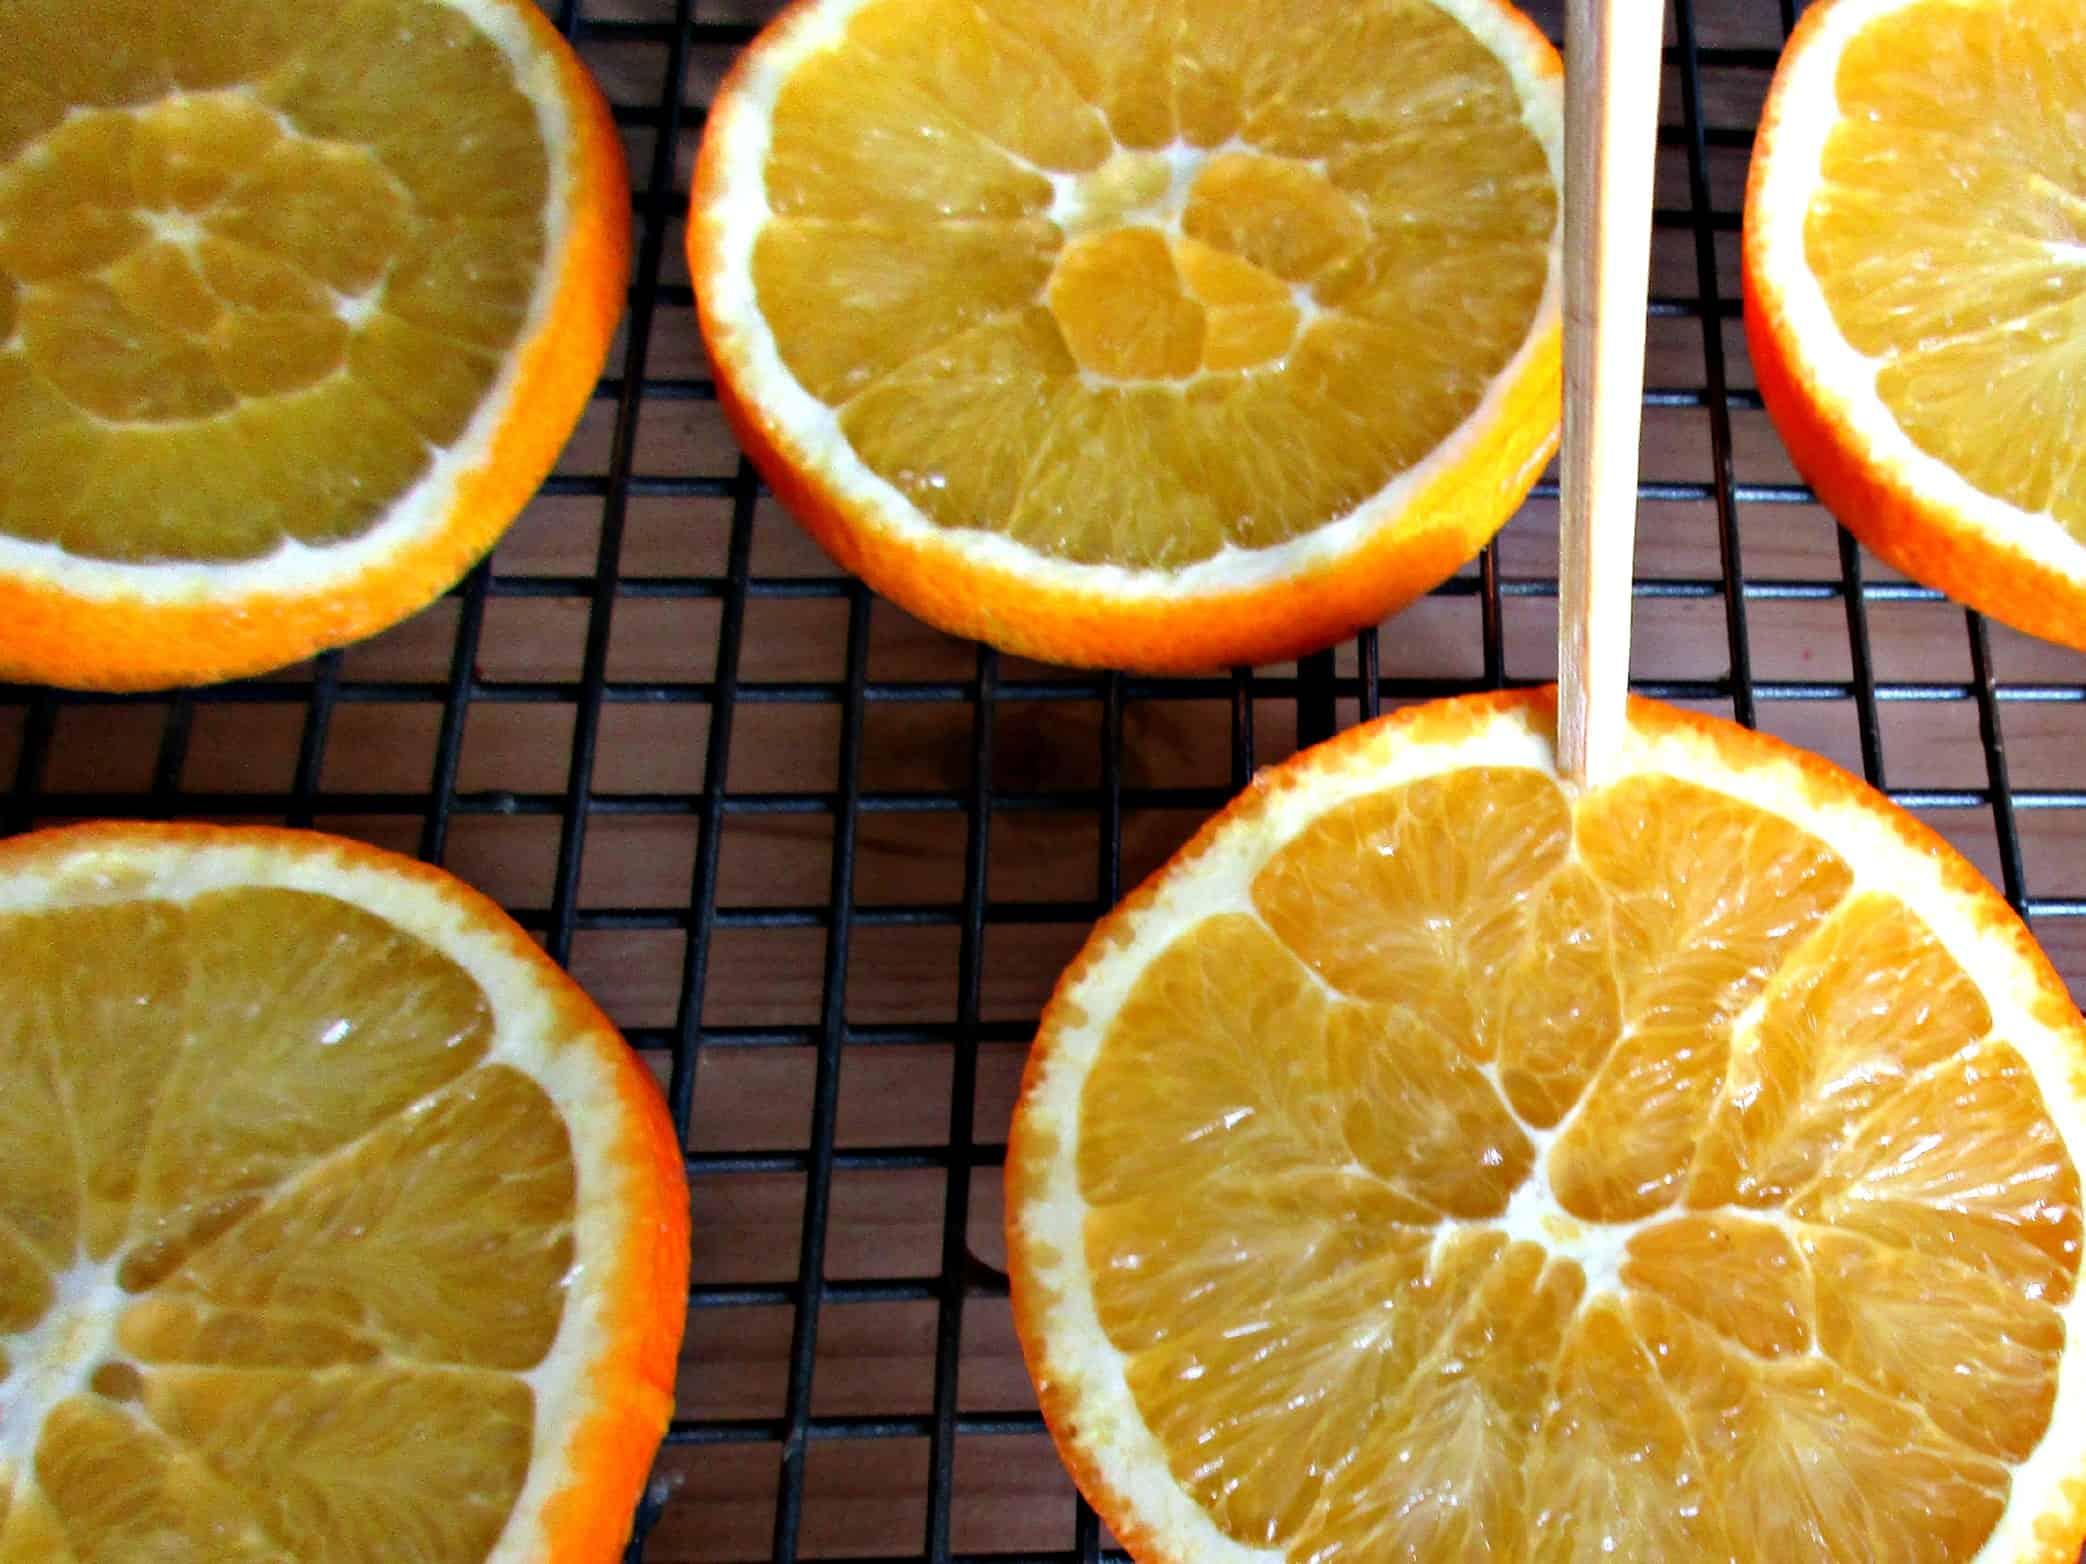 how to make potpourri from orange peels